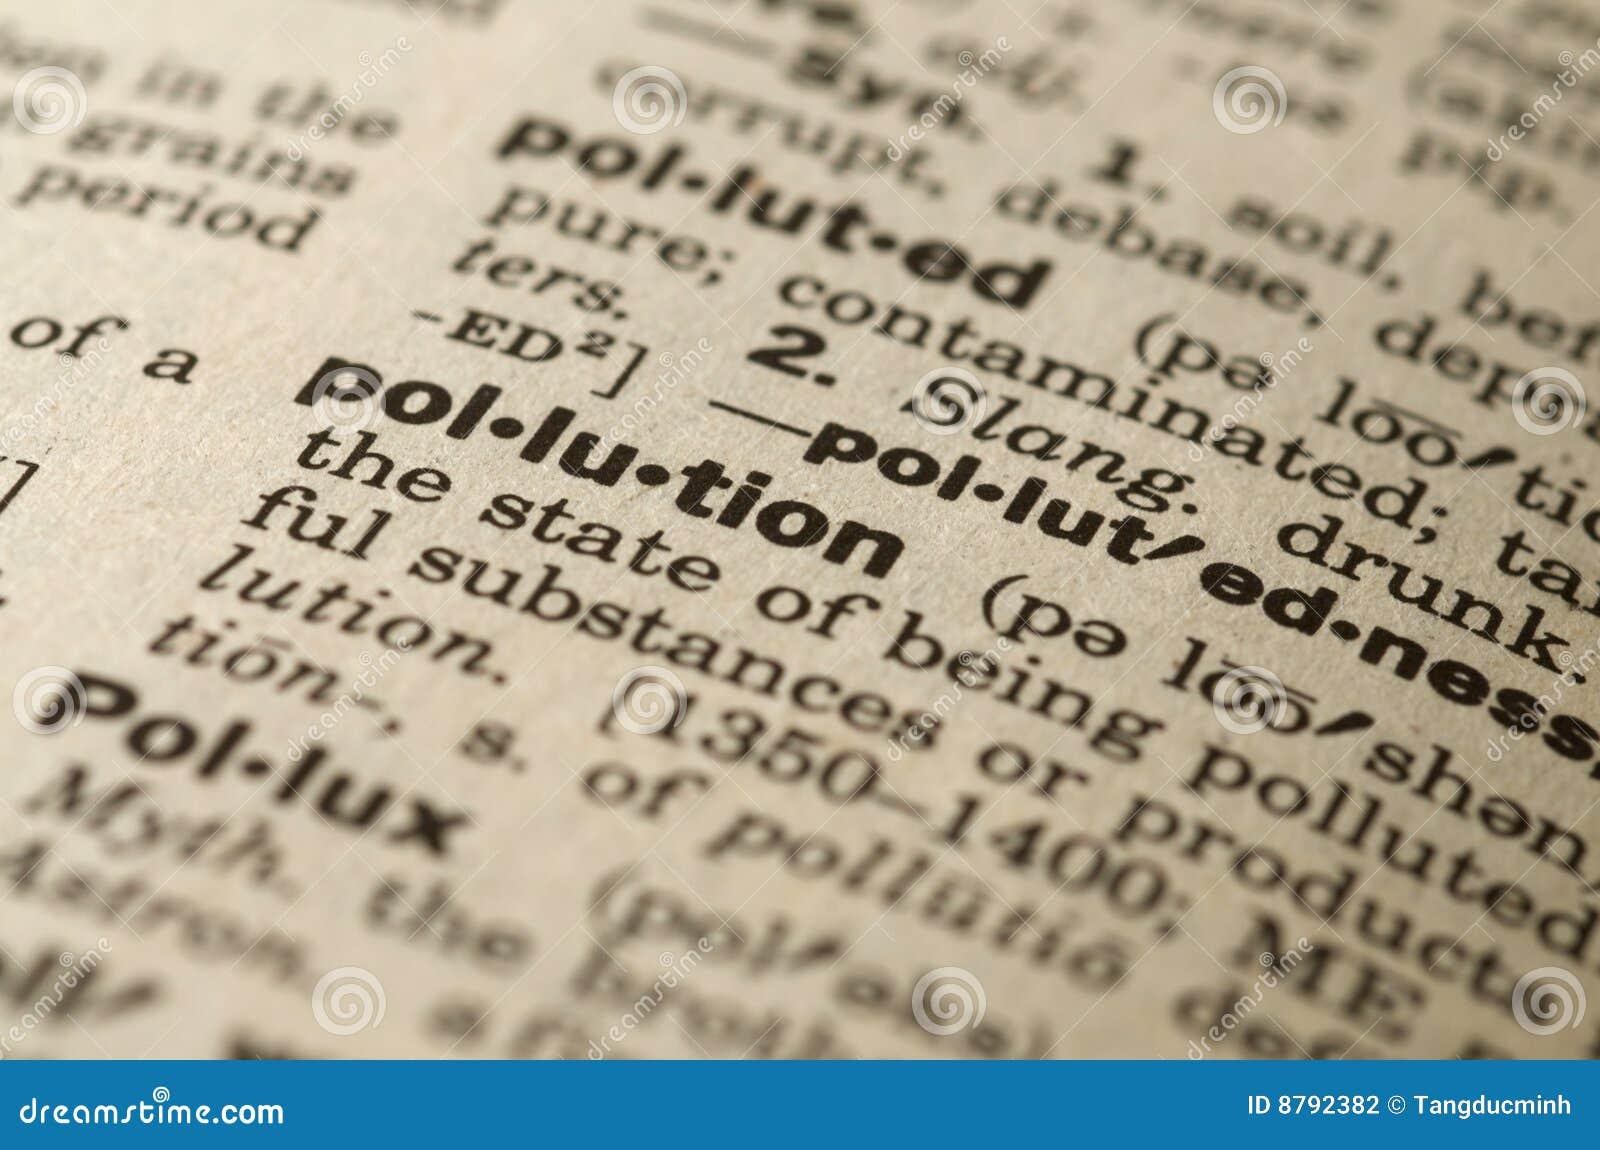 Definicion De Pergola En Ingles Samling Av De Senaste  # Muebles Definicion En Ingles